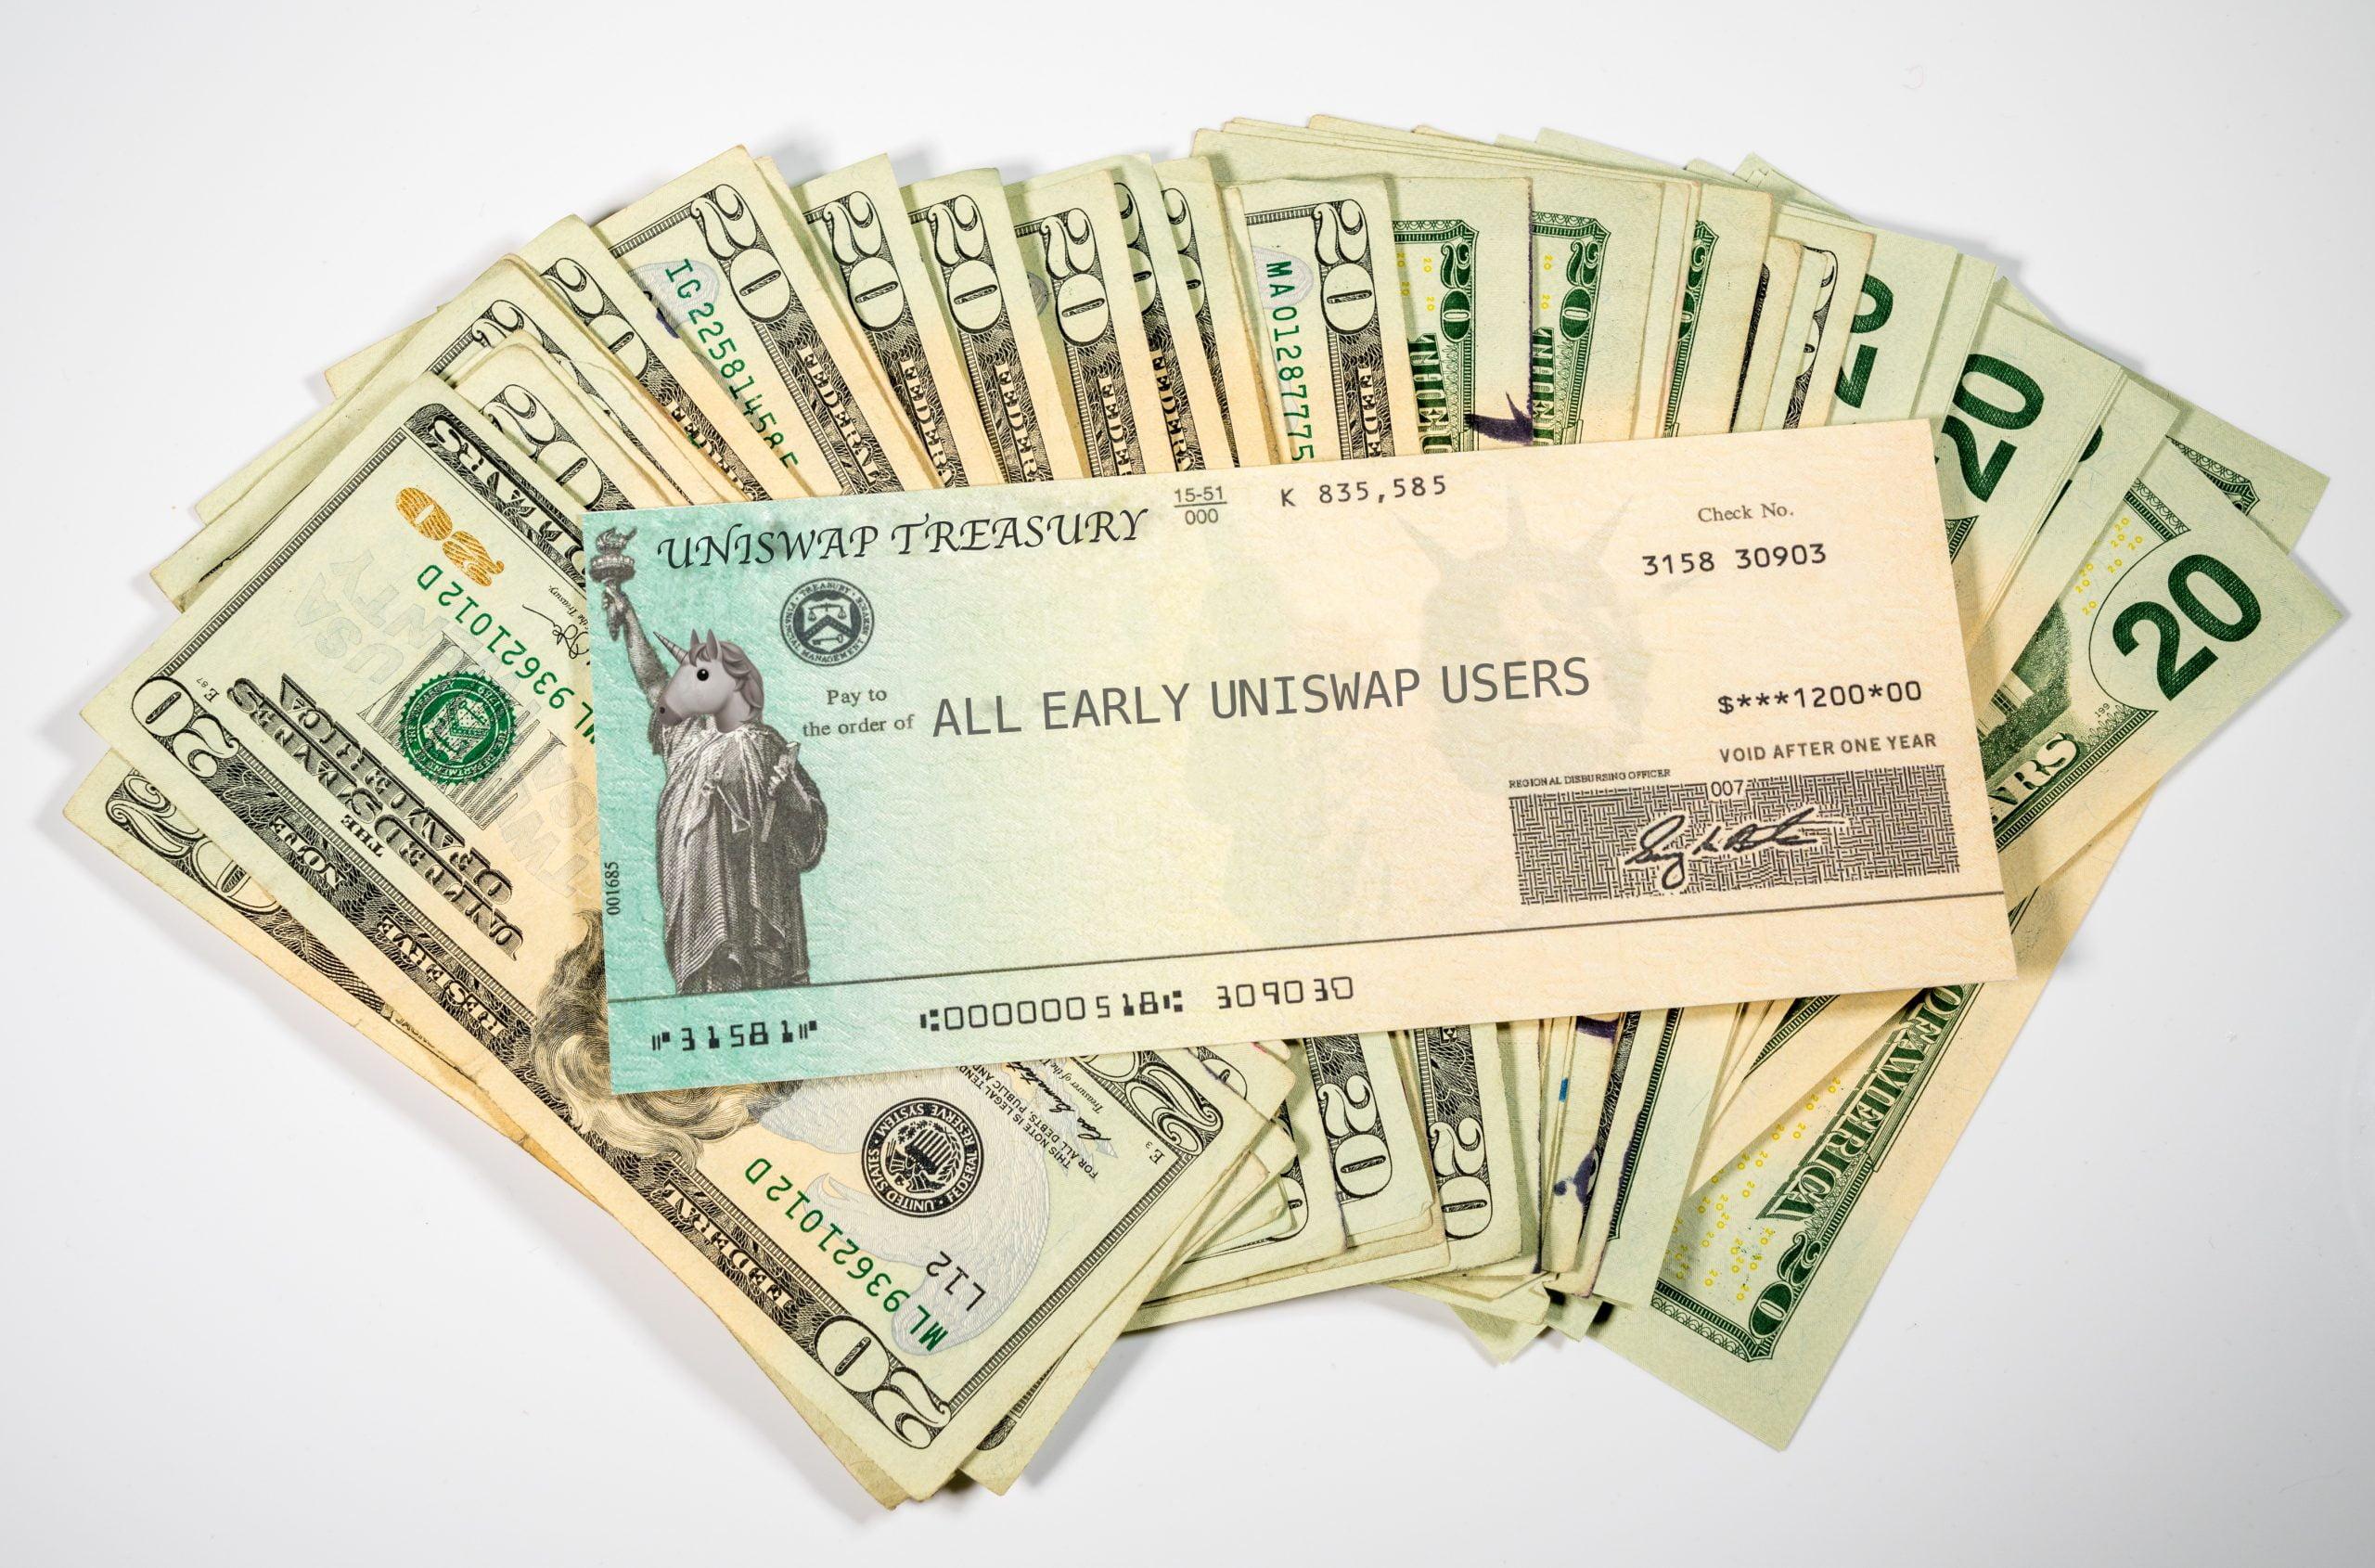 uniswap crypto stimulus check